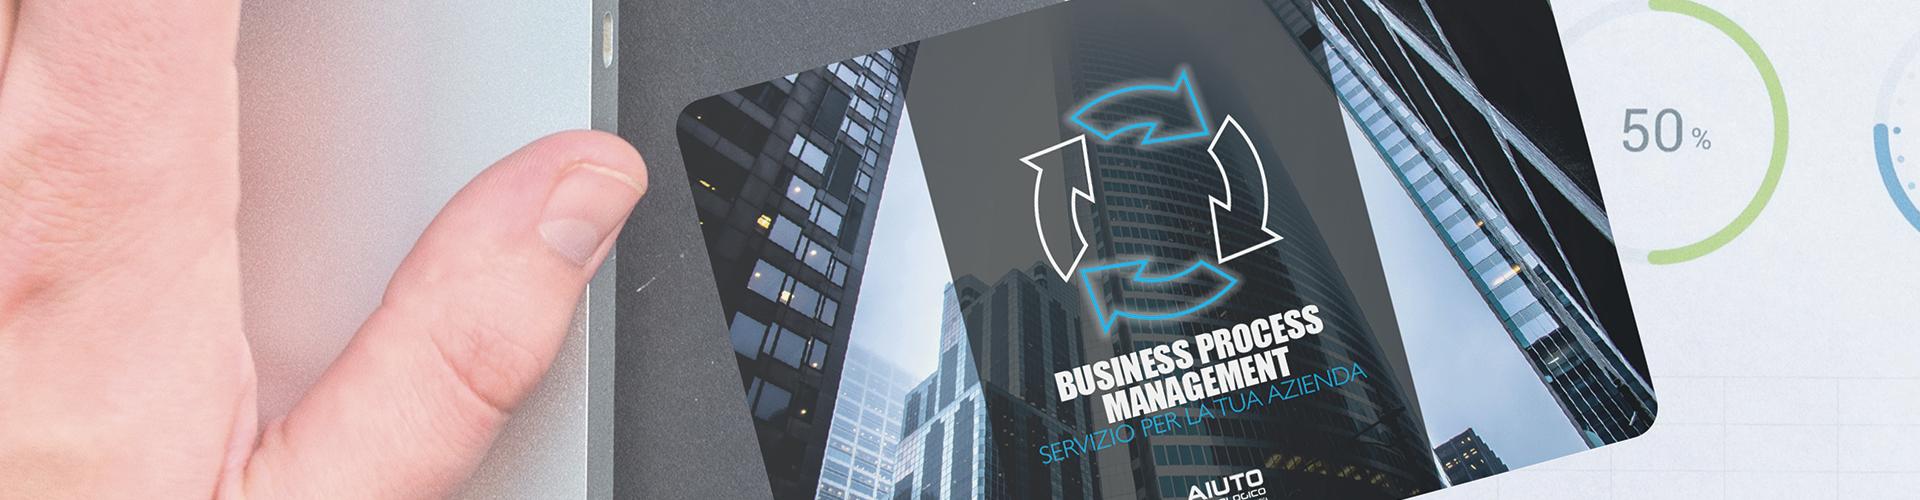 Aiuto Tecnologico: business process management